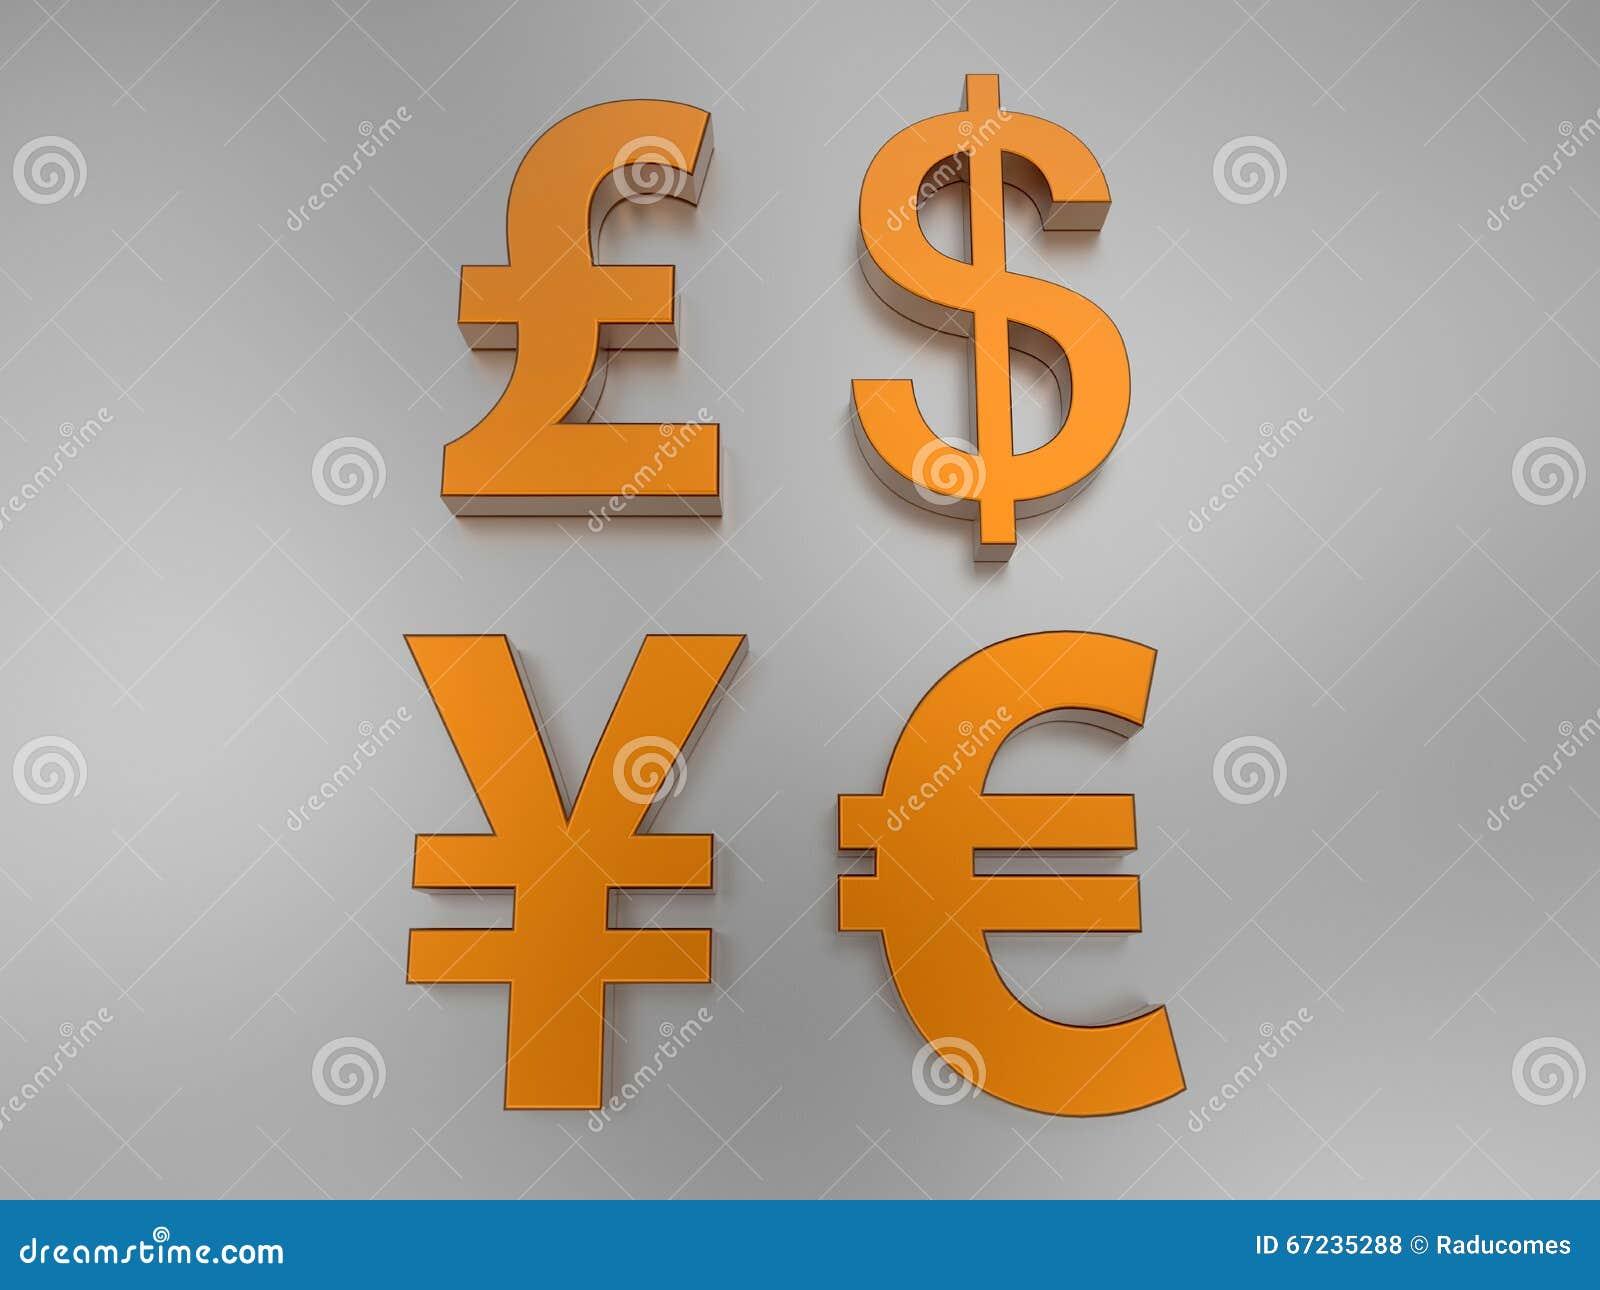 International money symbols stock illustration illustration of international money symbols buycottarizona Gallery